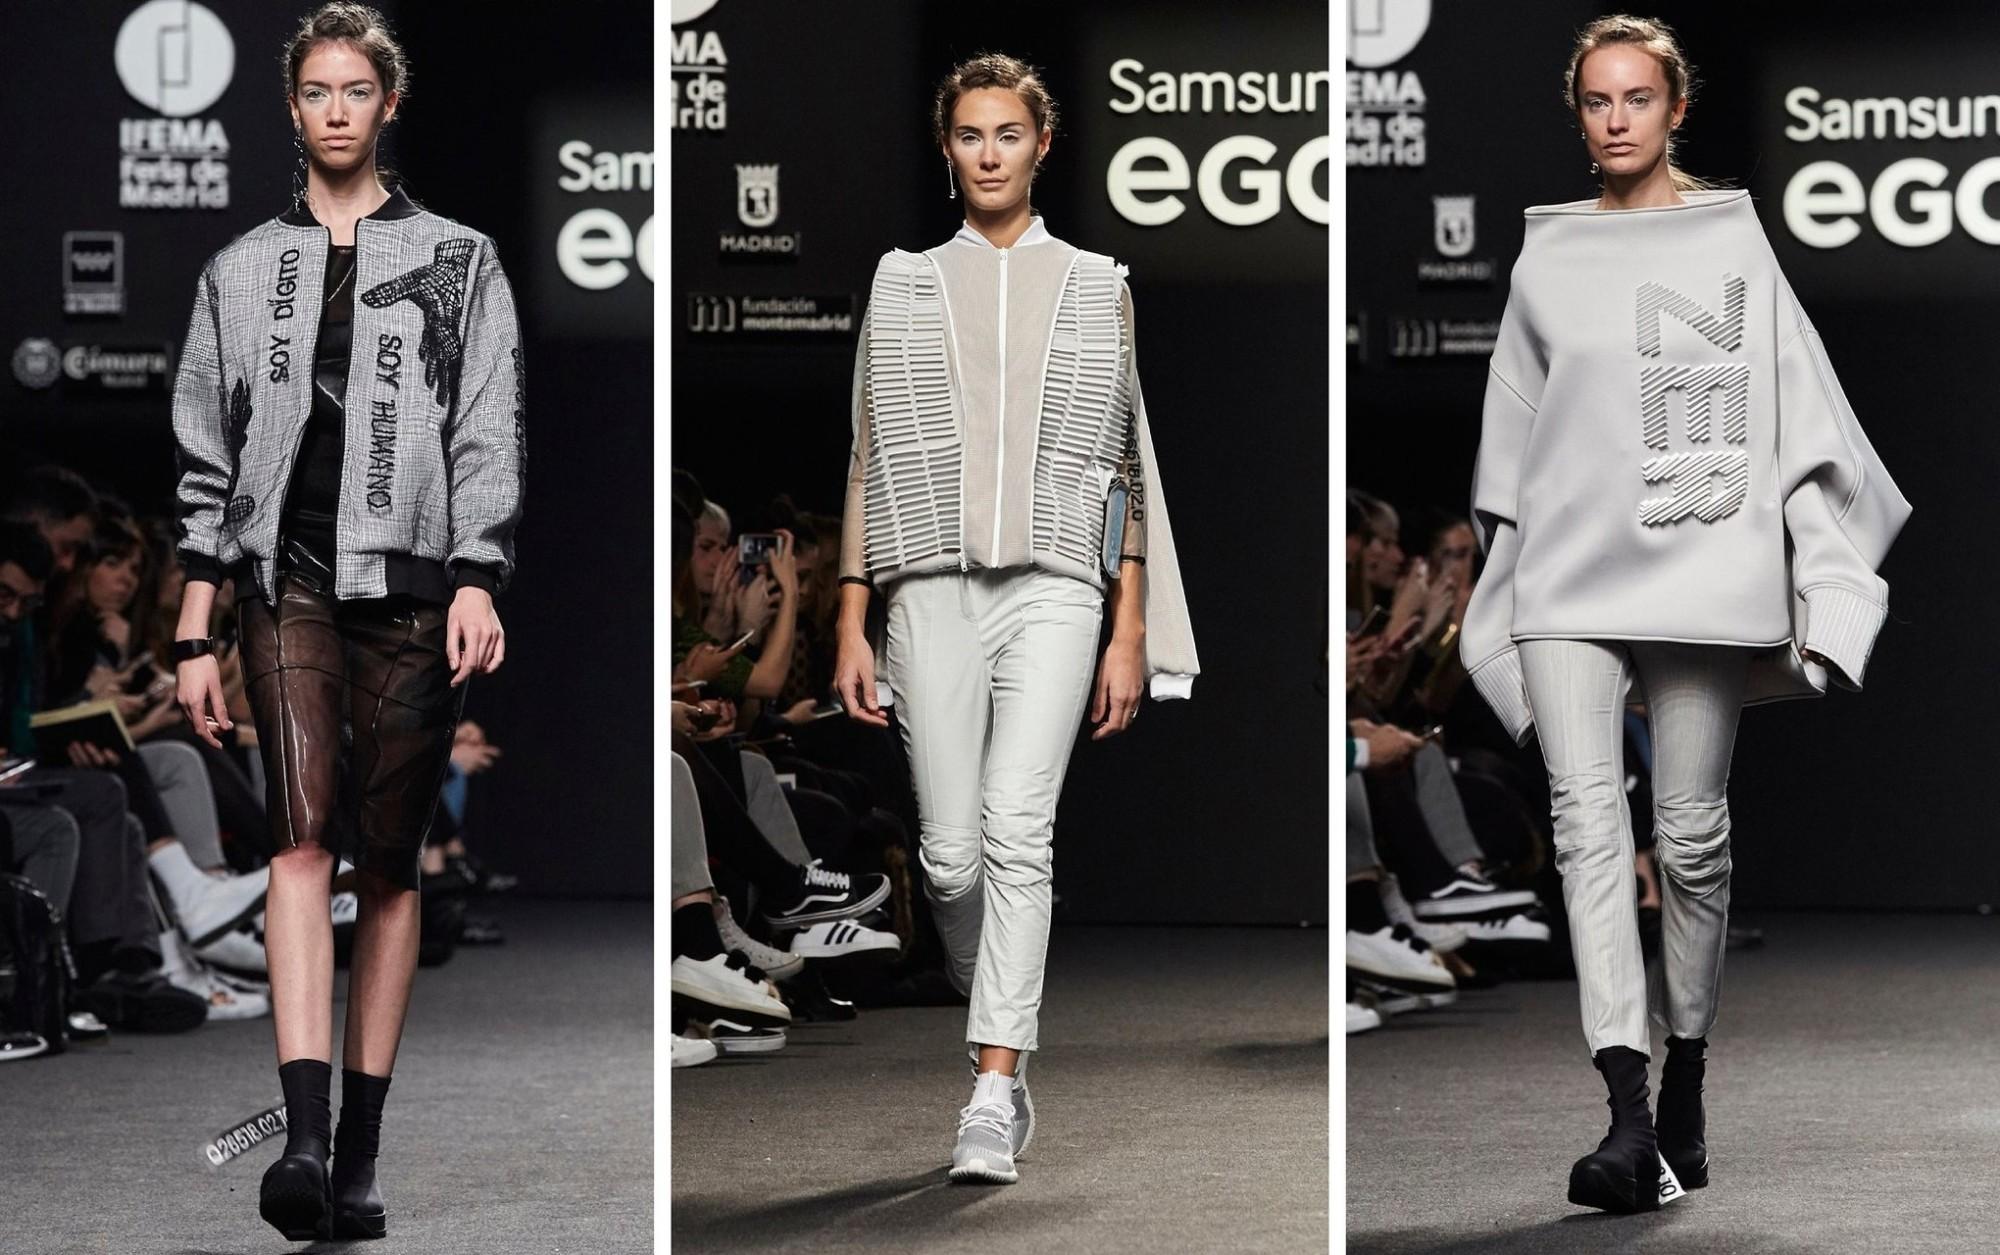 BCN3D ZER 3D printing fashion samsung ego catwalk